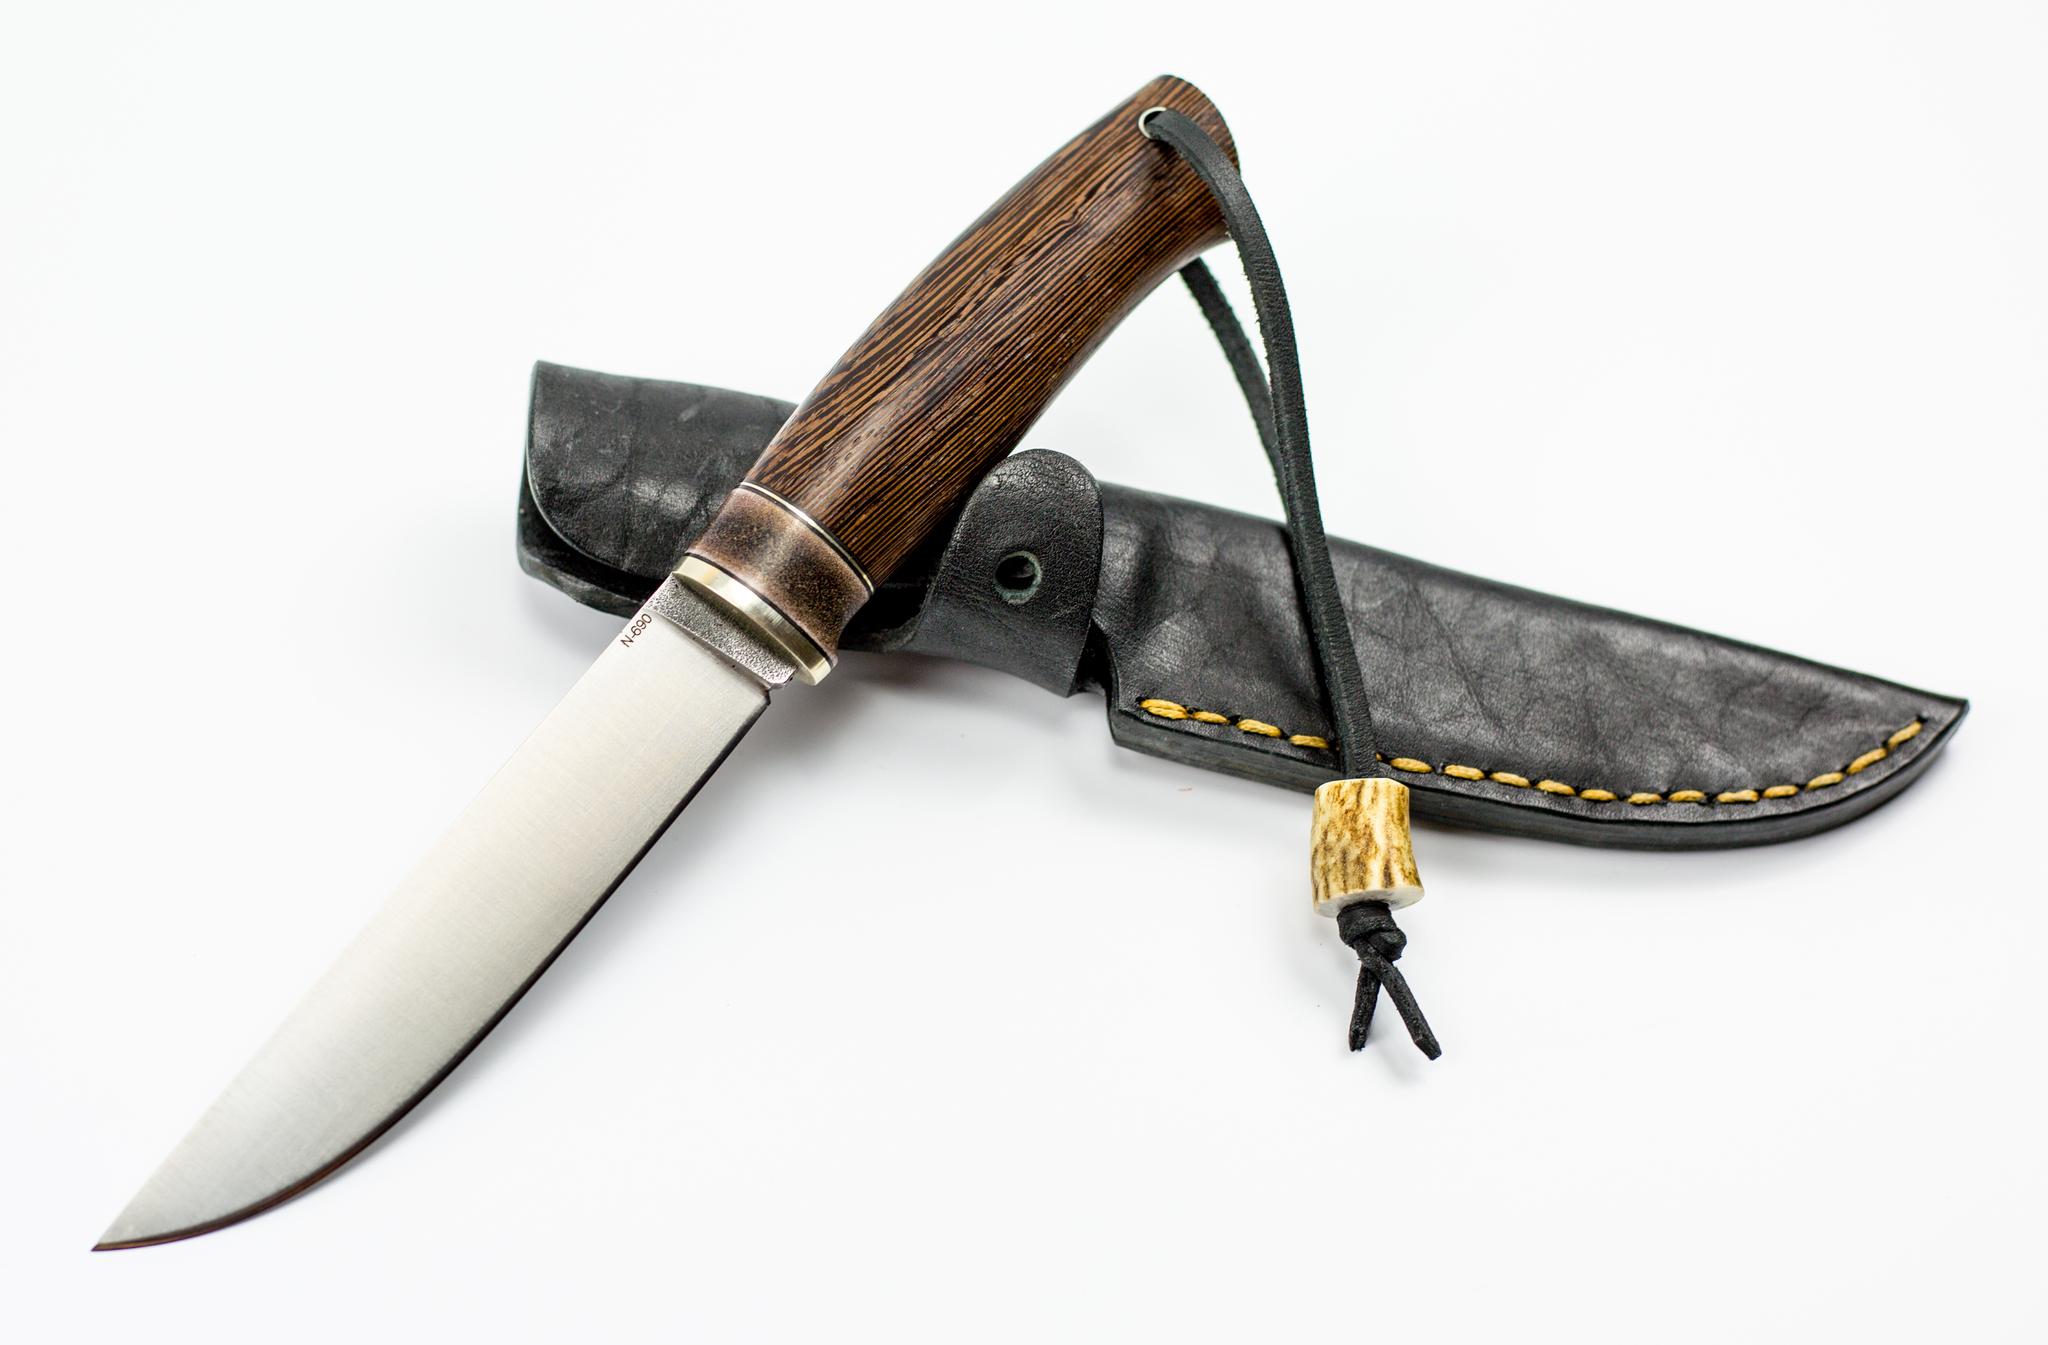 Нож Лиман, сталь N-690, венге, рог лося от Sander